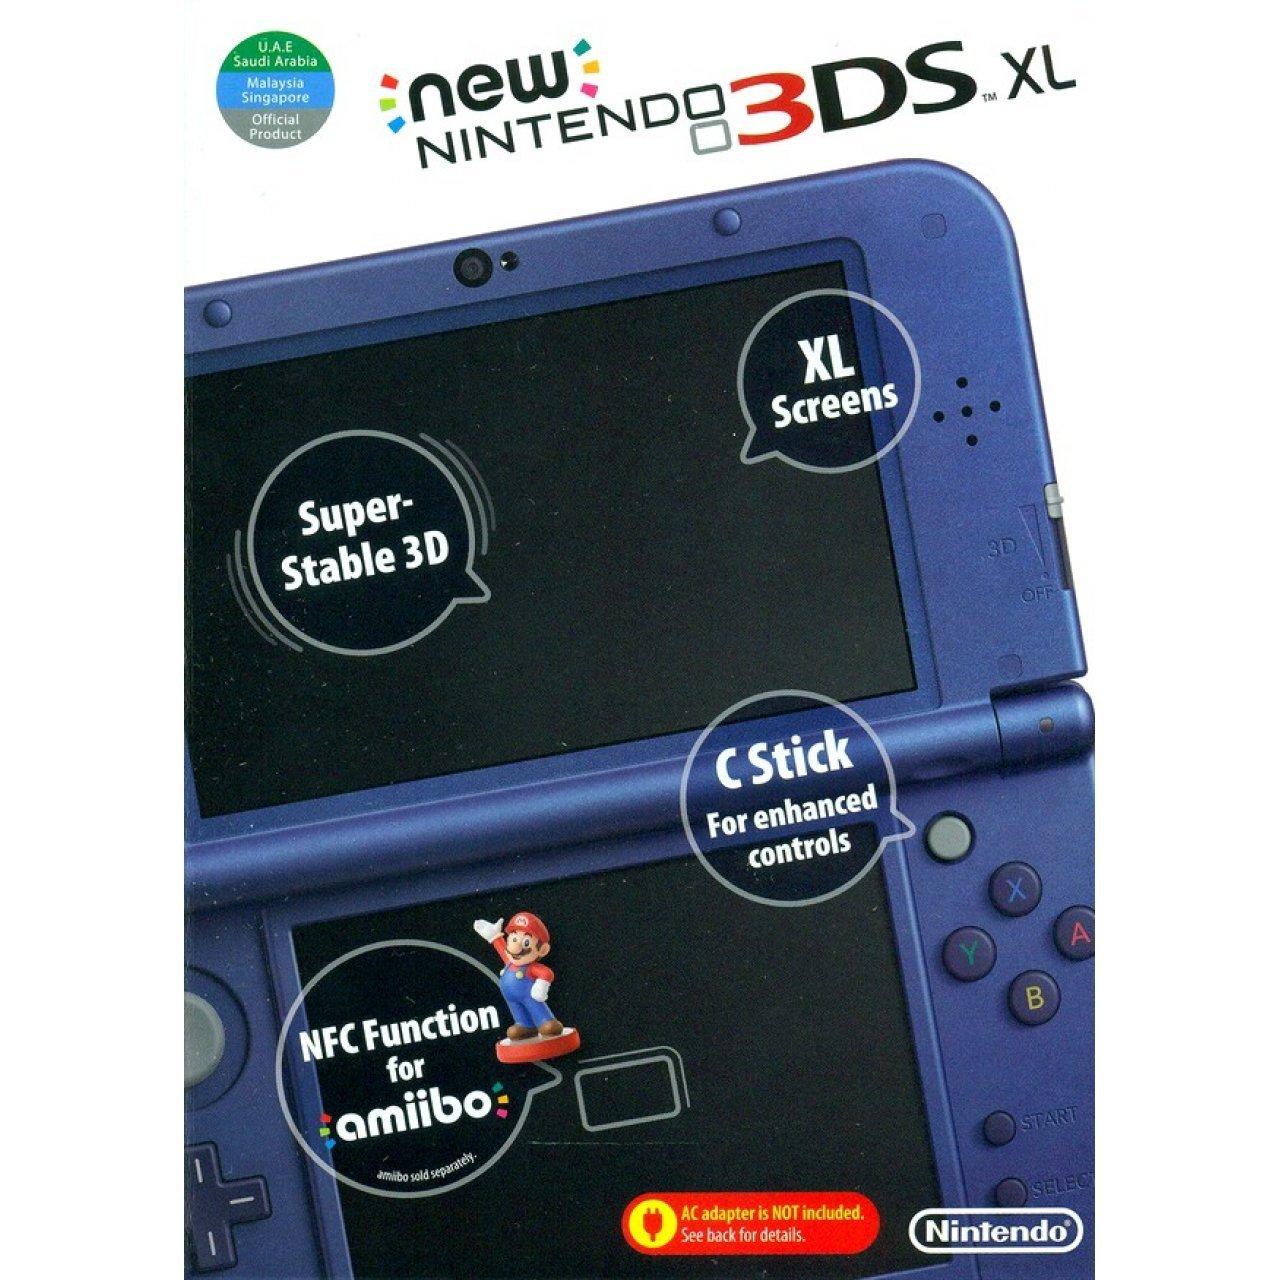 Nintendo New XL - Nintendo 3DS